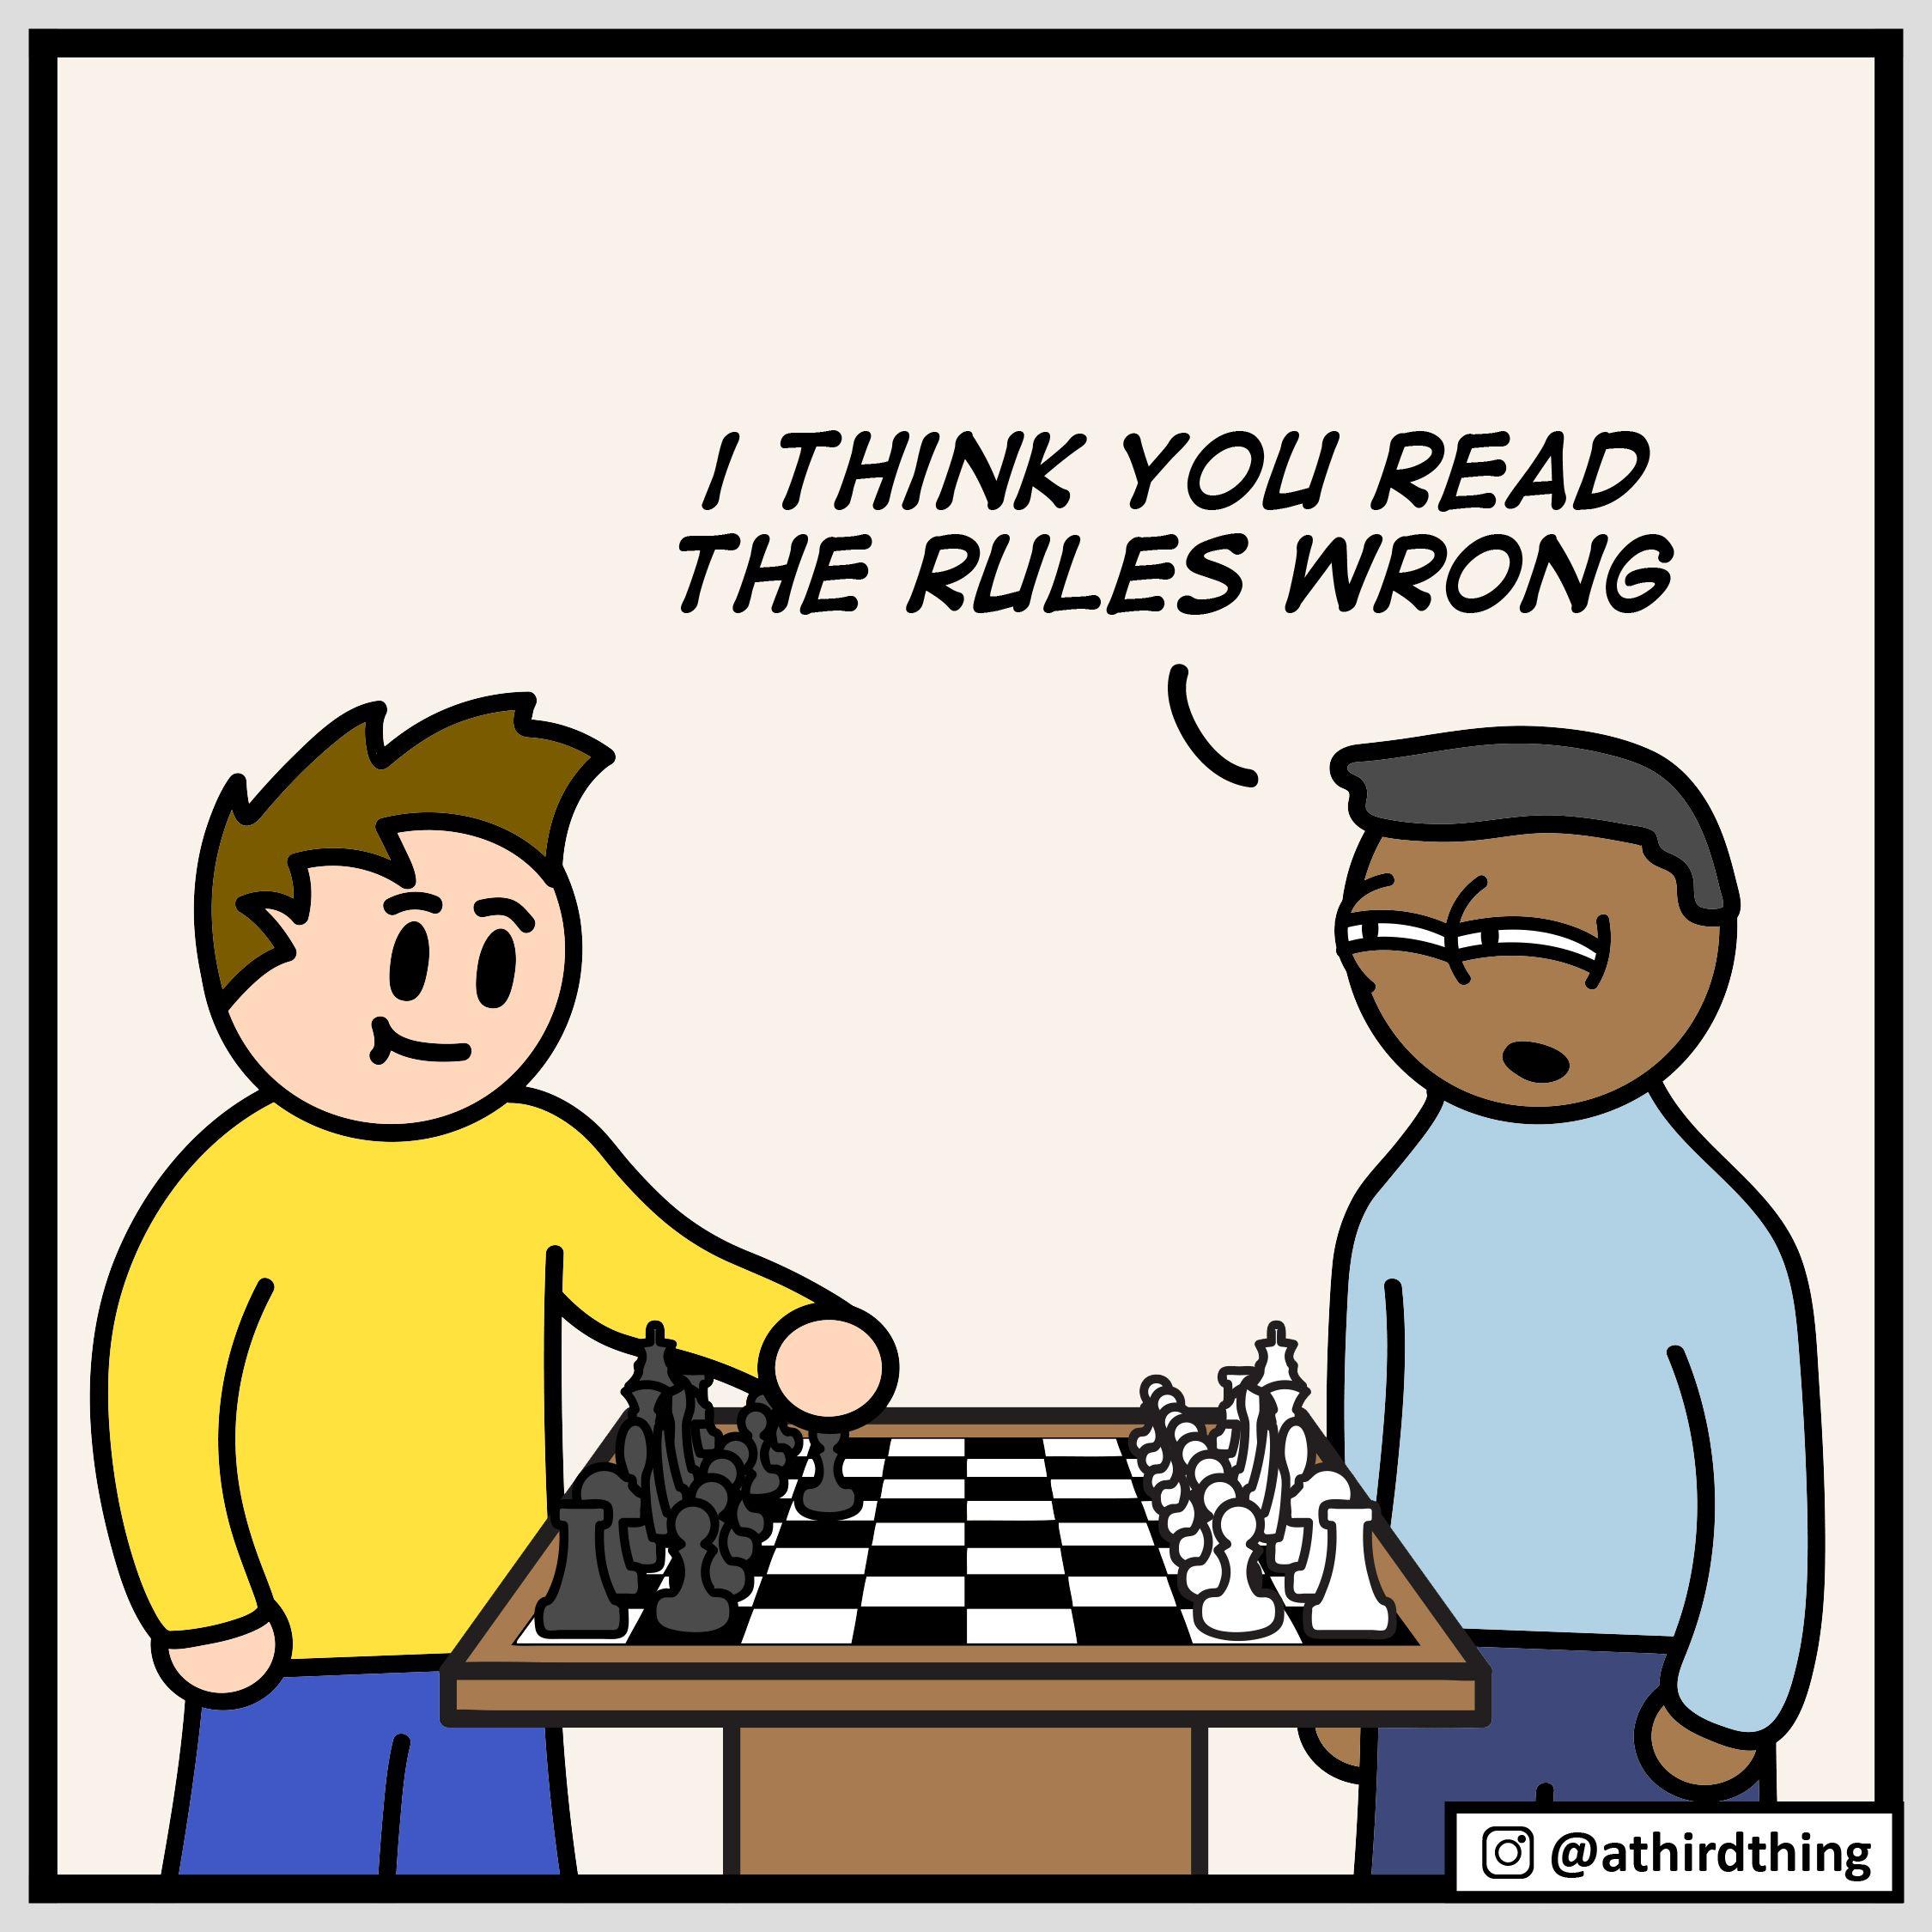 Chess - A Third Thing